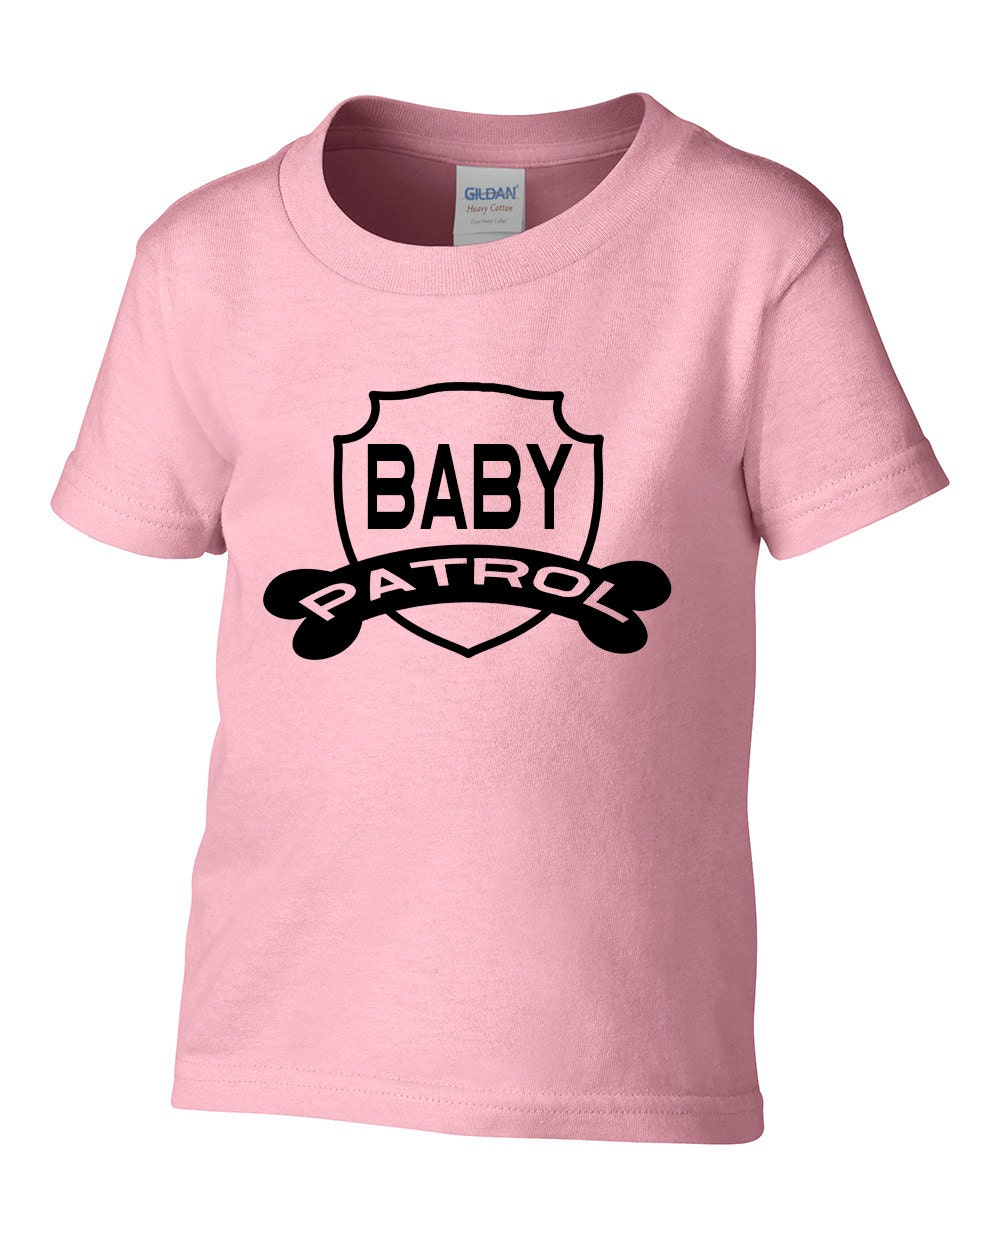 8bd1b185a Baby Patrol Toddler T-Shirti Have Shat my TrousersNewborn   Etsy